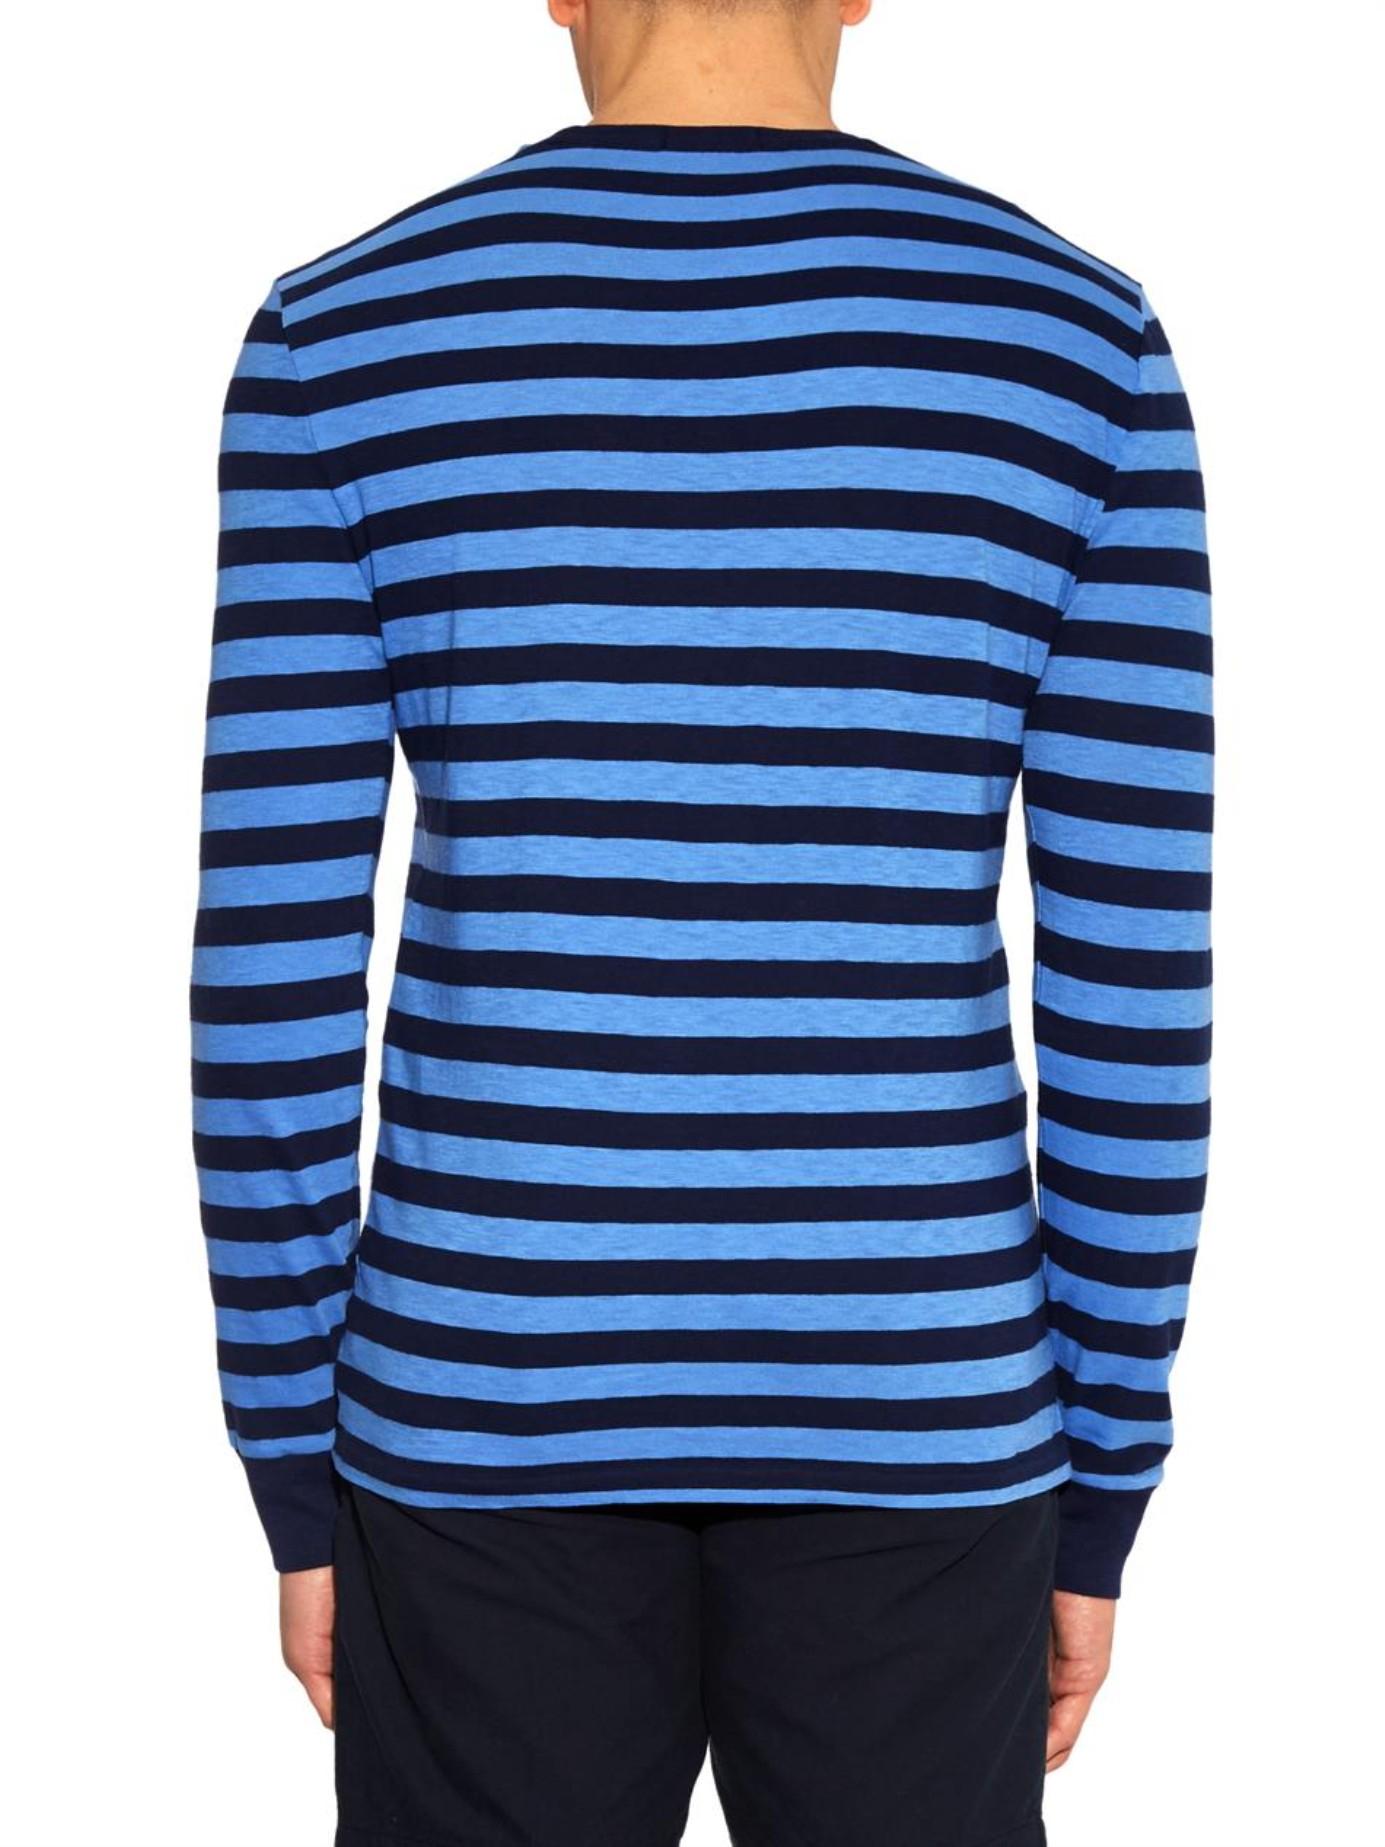 Lyst - Polo Ralph Lauren Long-Sleeved Striped Jersey T ...